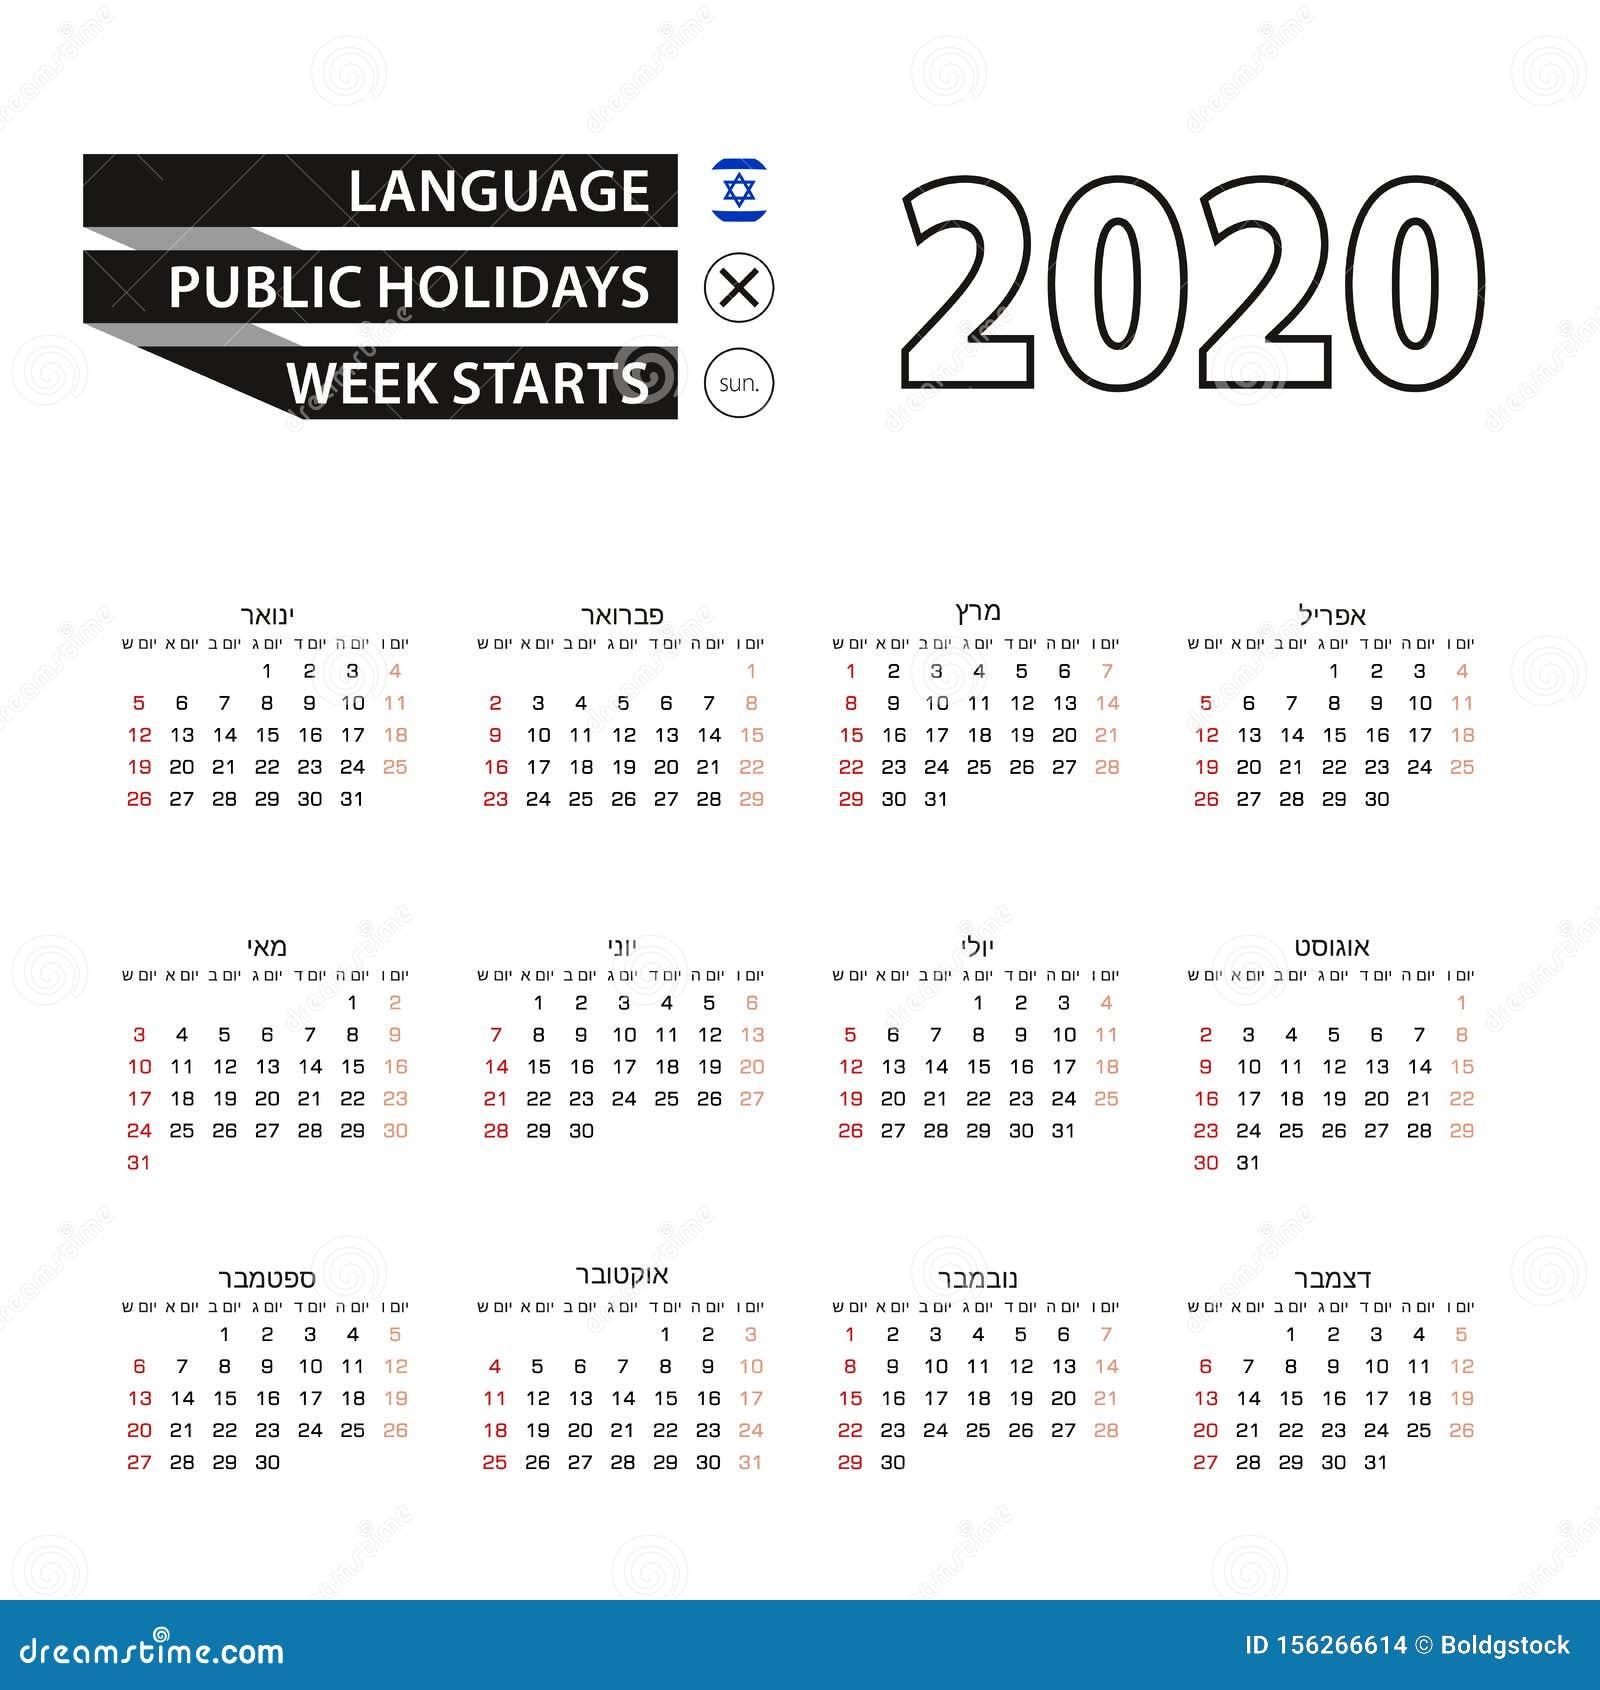 2020 calendar in Hebrew language, week starts from Sunday